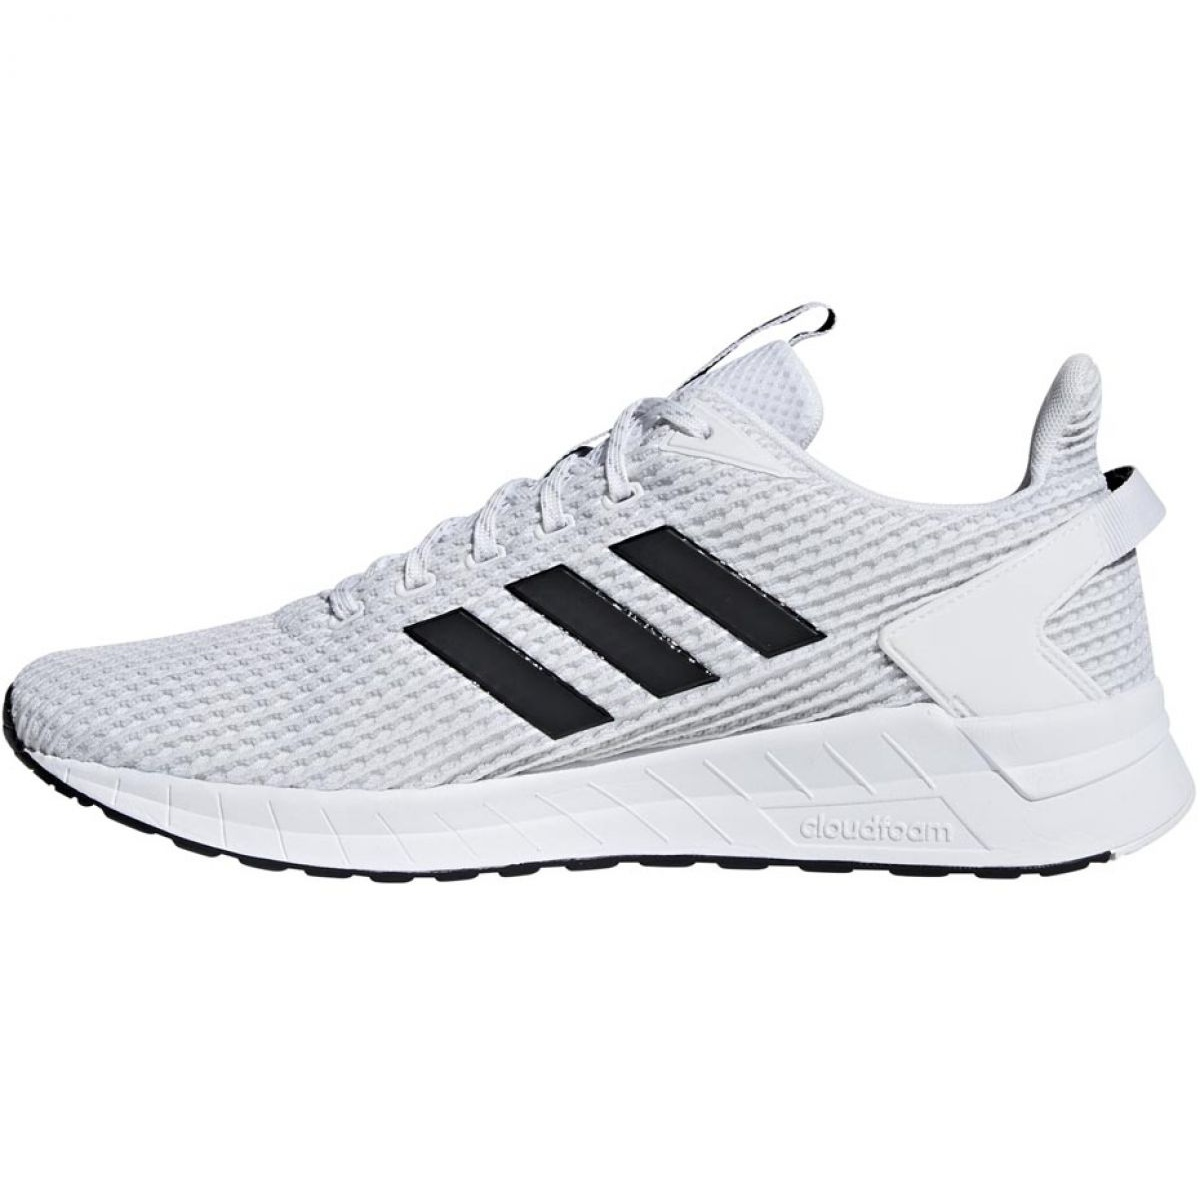 Chaussures de running adidas Questar Ride M F34982